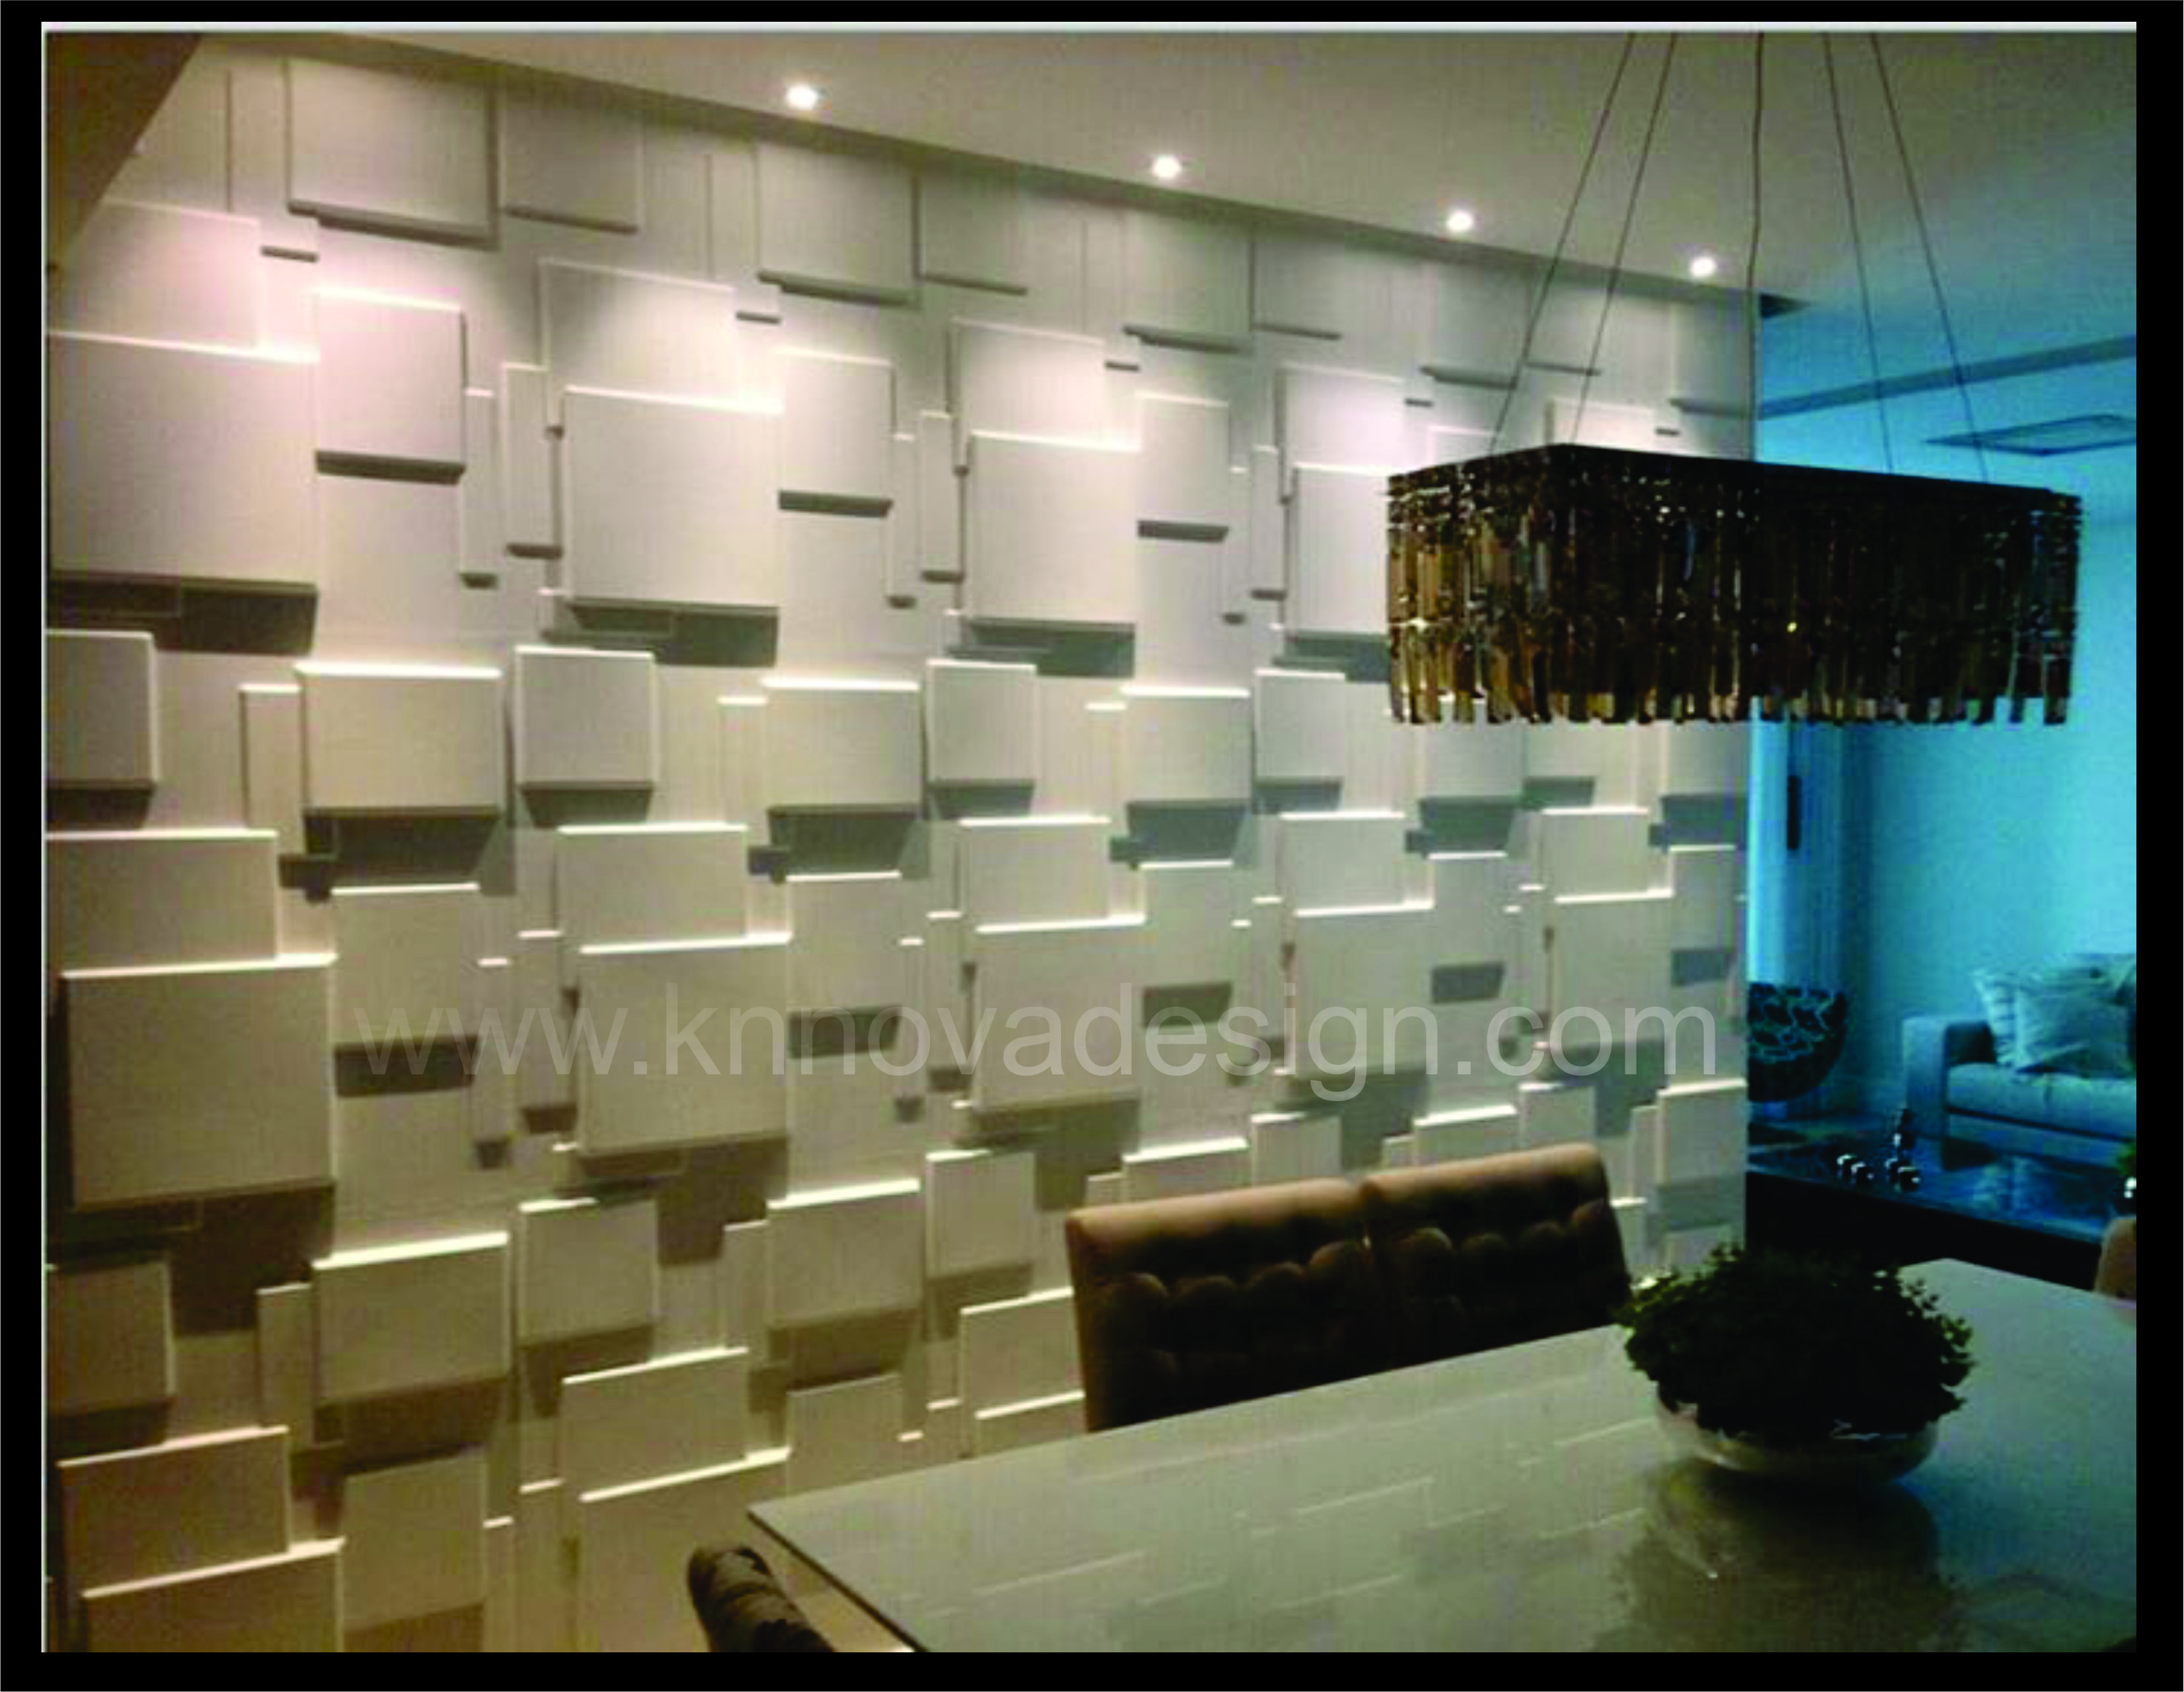 Pin de panel 3d texturas y acabados arquitectonicos en paneles 3d ...